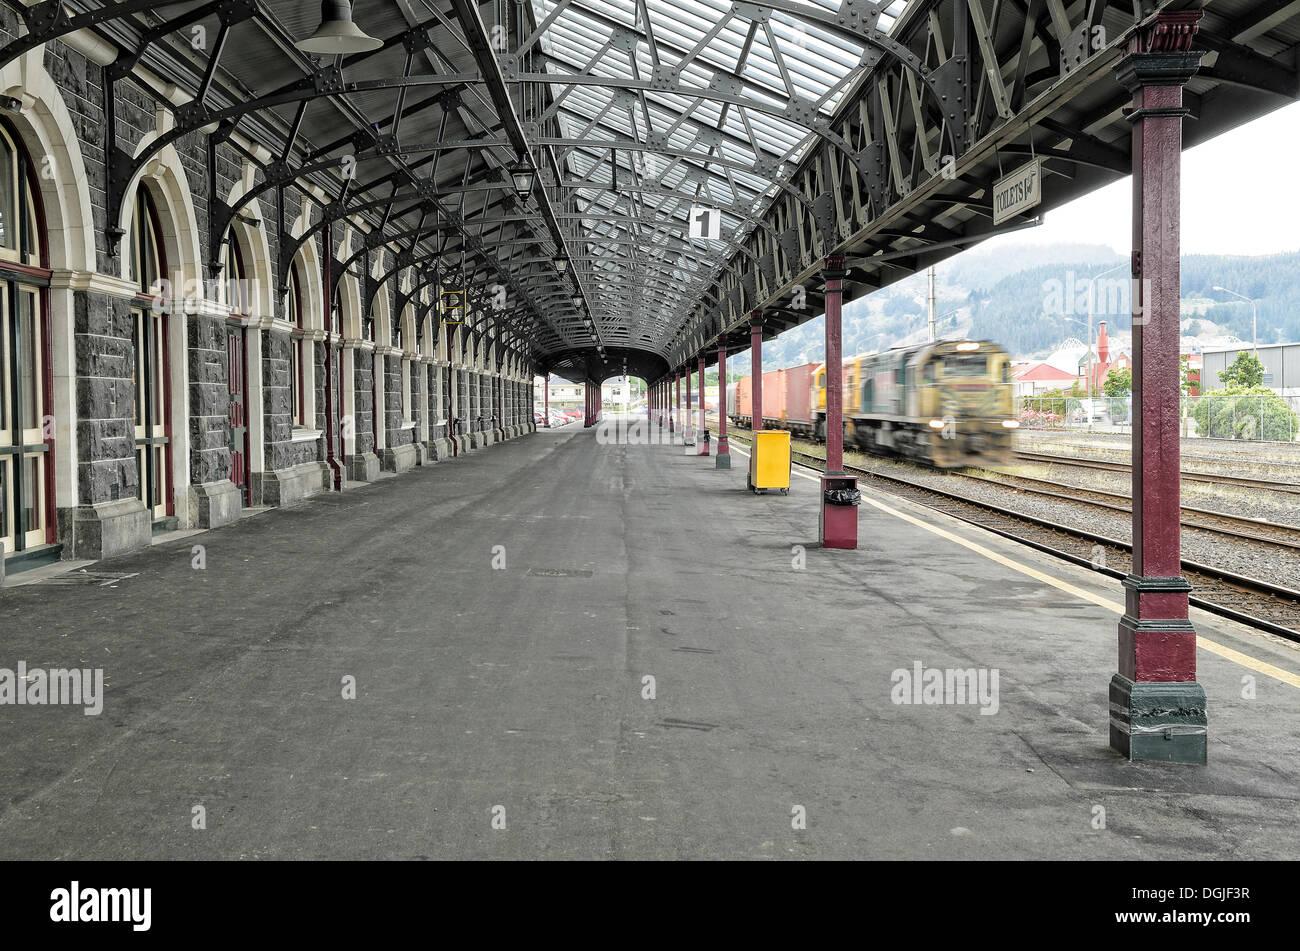 Platform with a train entering the station, historic Dunedin Railway Station, Dunedin, South Island, New Zealand, Oceania - Stock Image